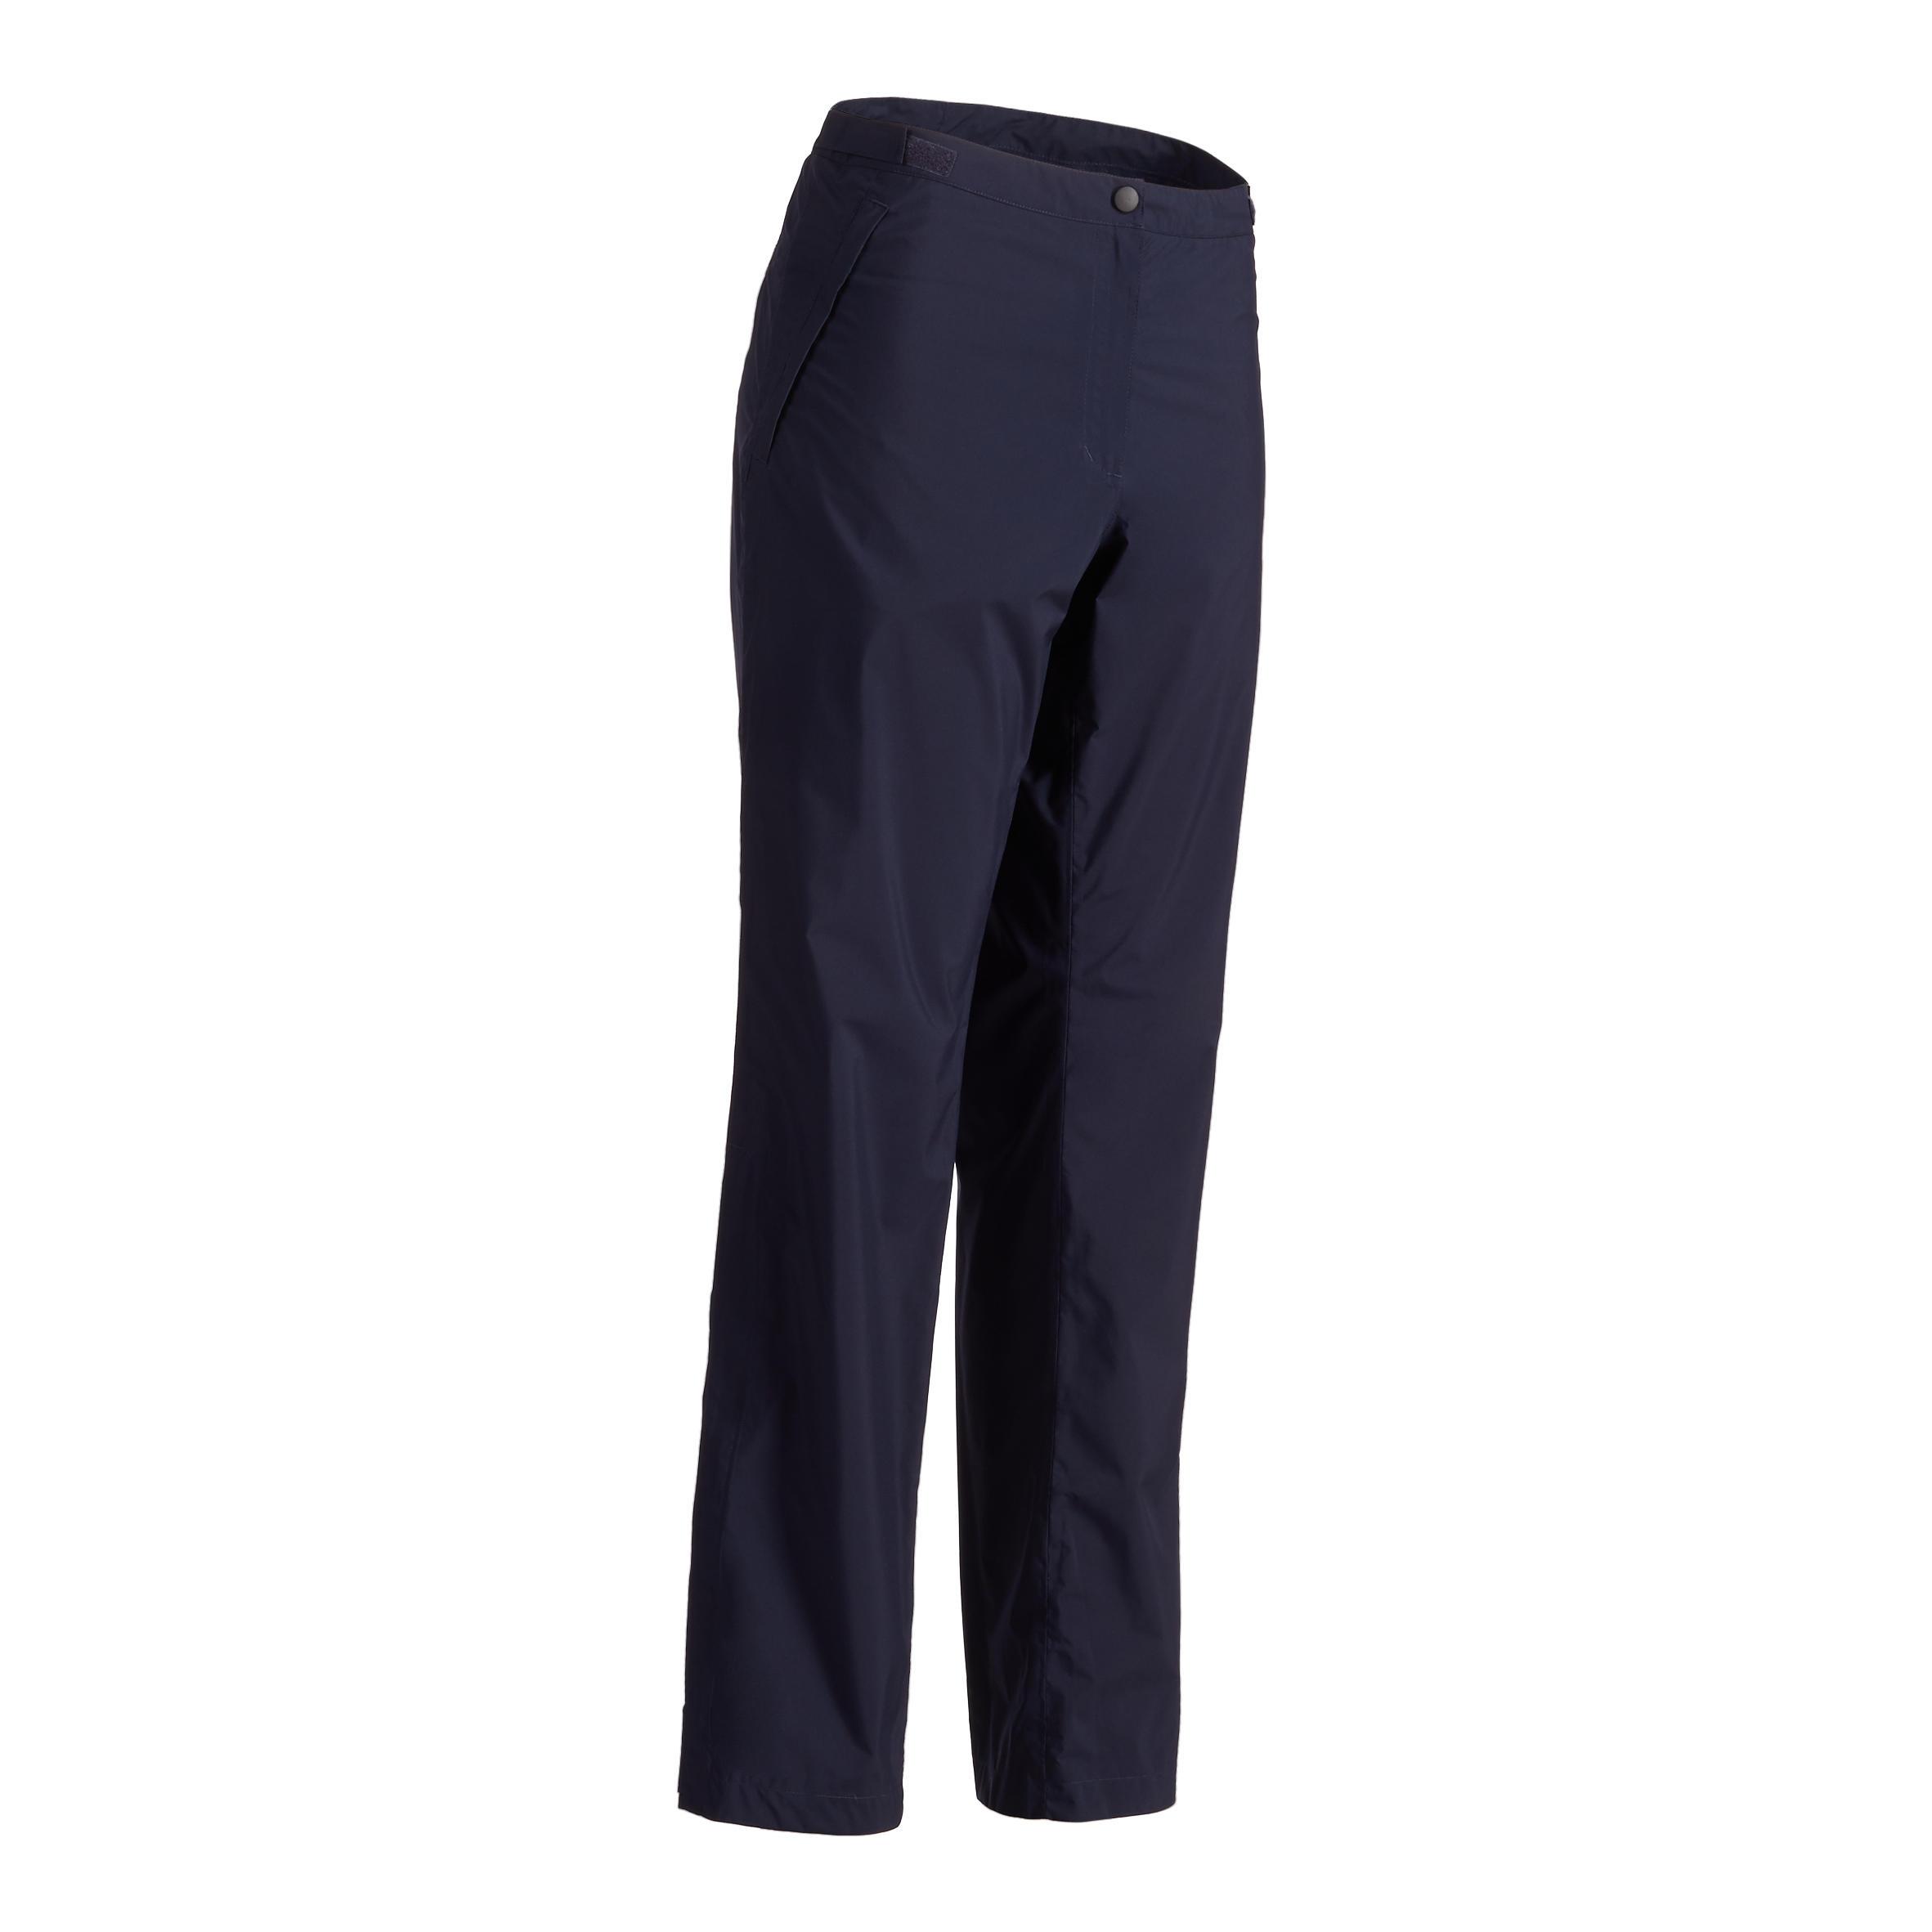 Golf Regenhose Damen marineblau | Sportbekleidung > Sporthosen > Regenhosen | Blau | Inesis